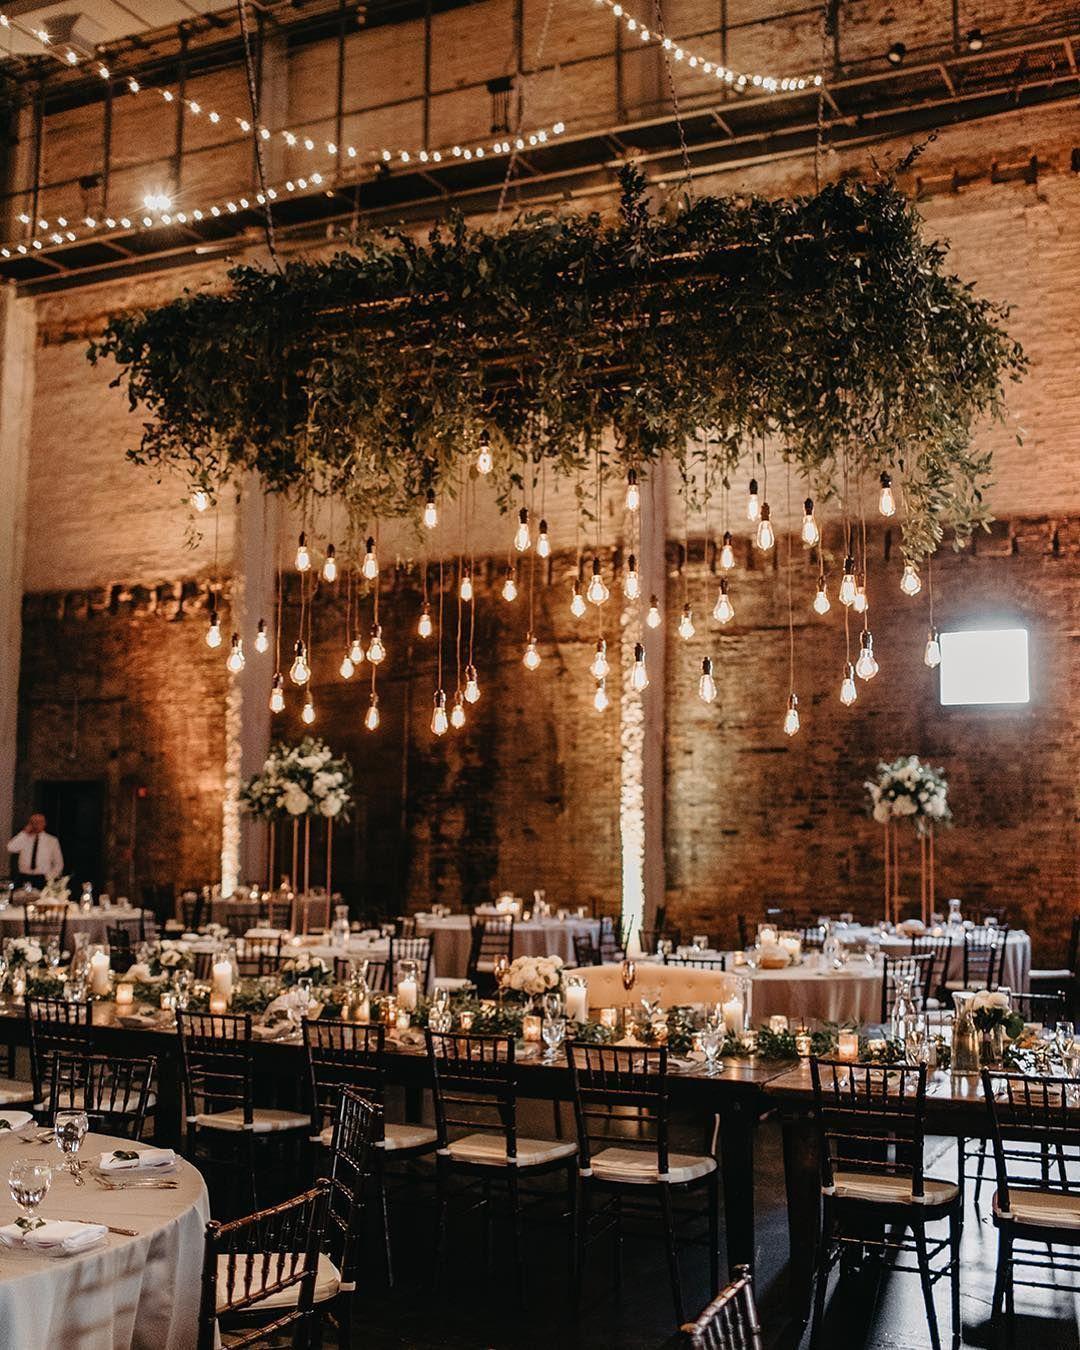 Vegas Weddings Christmas Wedding Favours Floral Wedding Motif Country Barn Weddings Wedding Lights Barn Wedding Reception